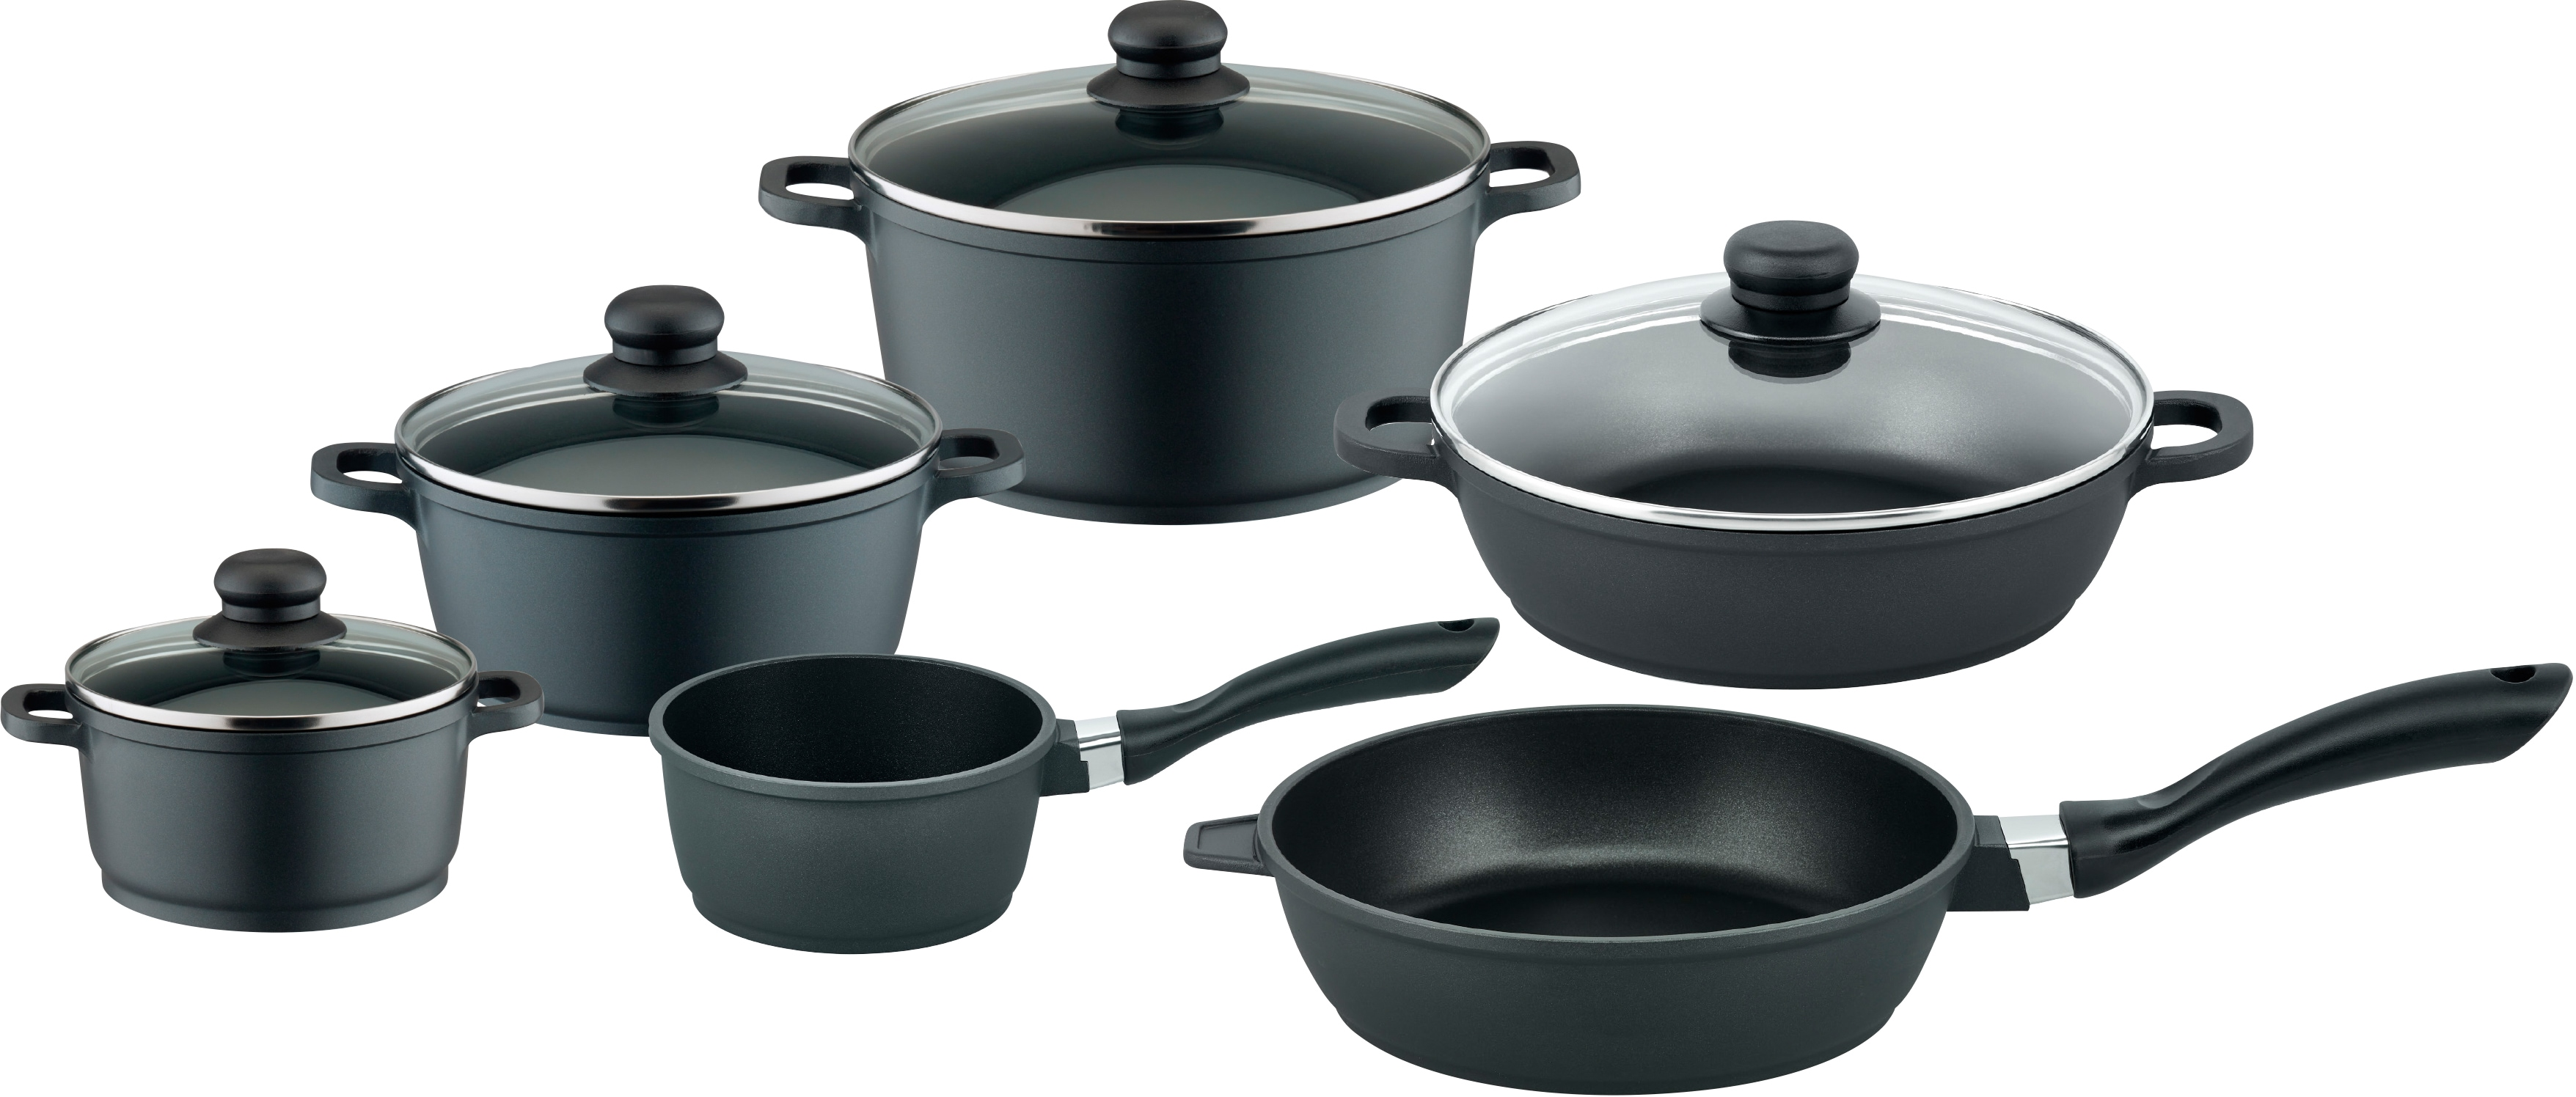 Elo - Basic Elo Basic Topf-Set Black Cast (Set, 10-tlg.) schwarz Topfsets Töpfe Haushaltswaren Topf